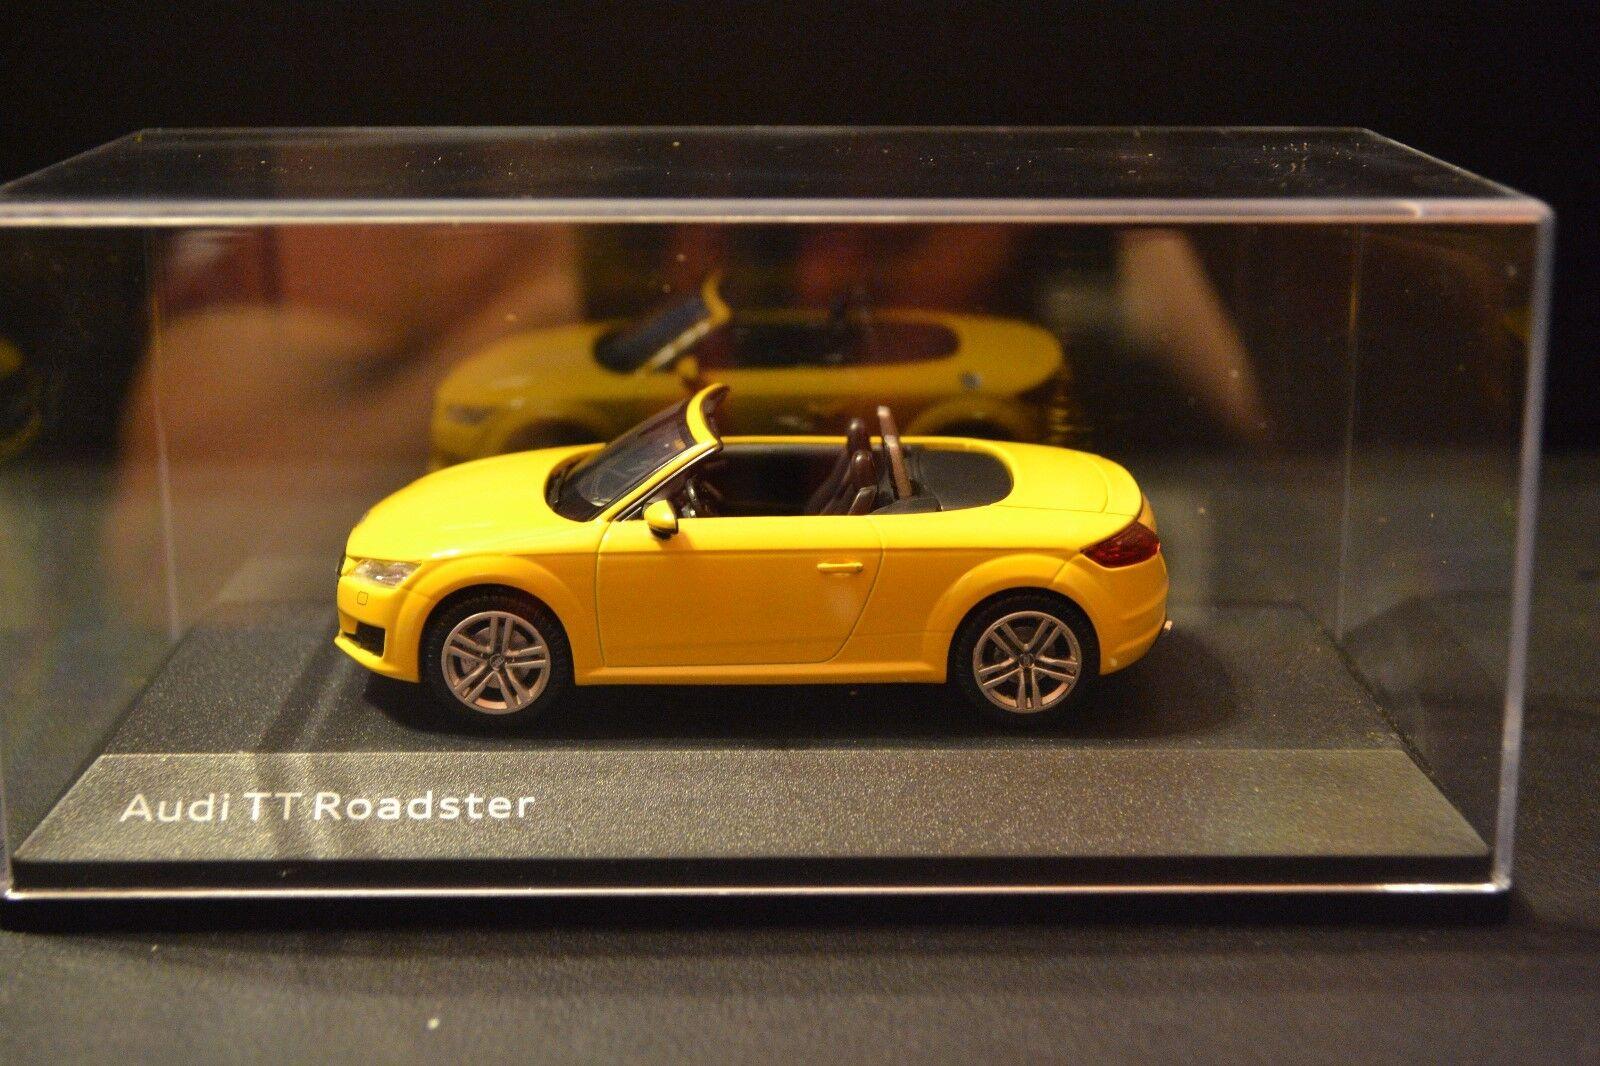 Audi TT Roadster Type 8S 2014 Kyosho Dealer Edition diecast in 1 43 scale 263